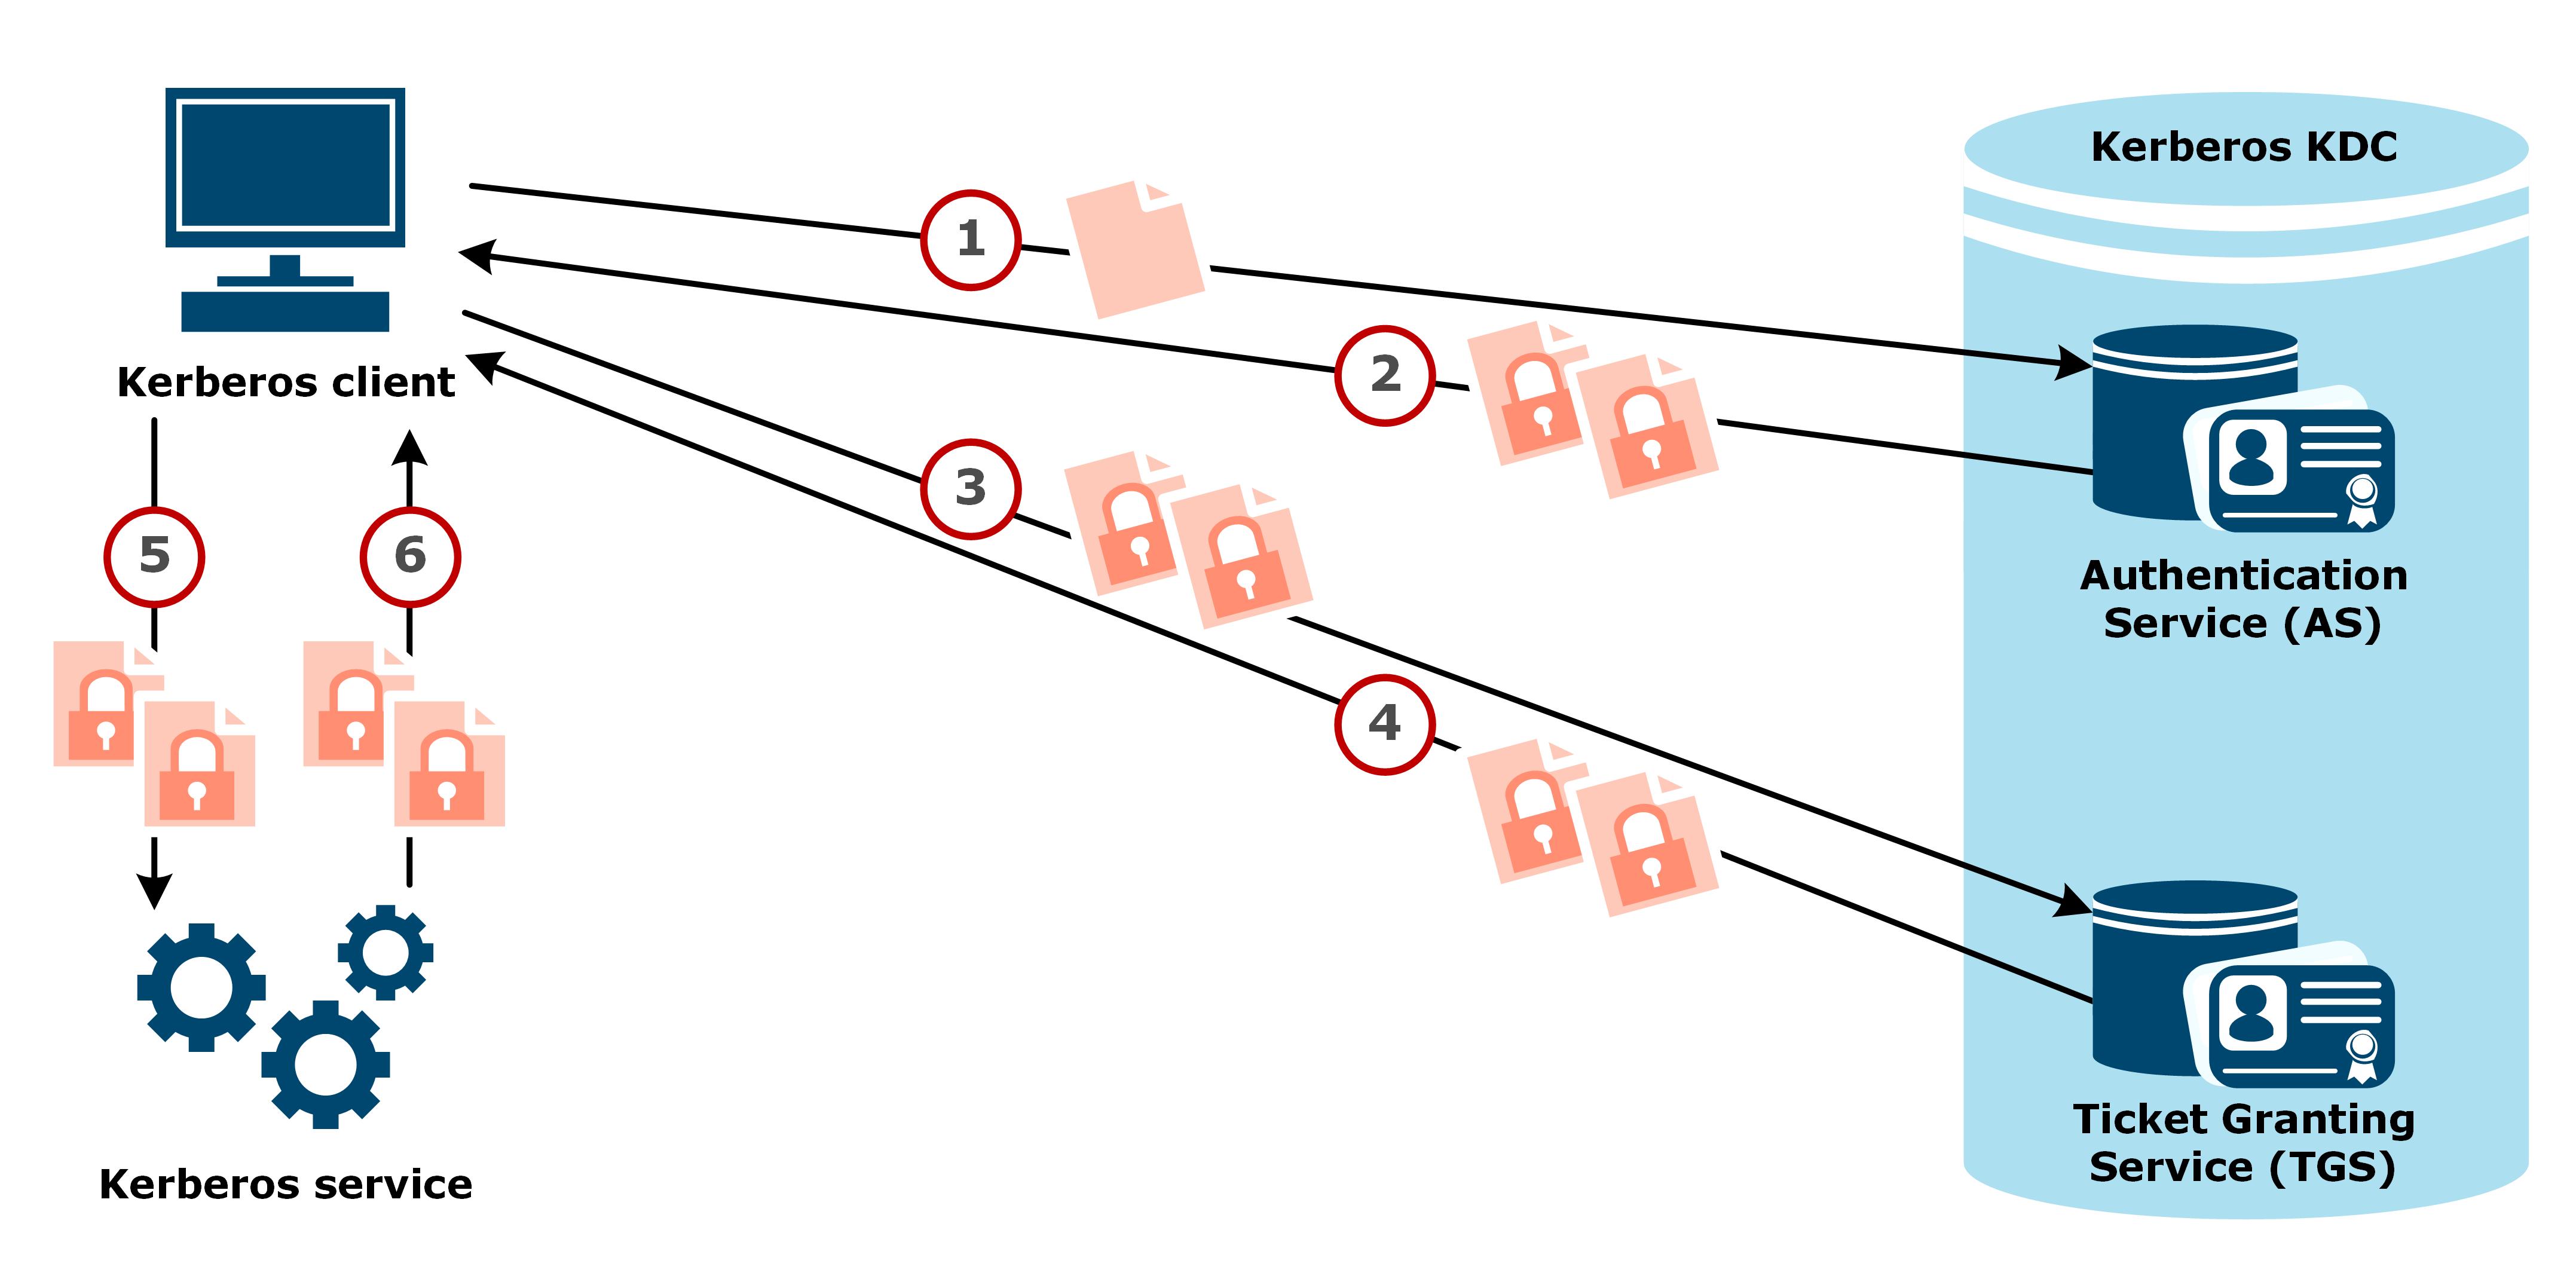 kerberoasting simplified